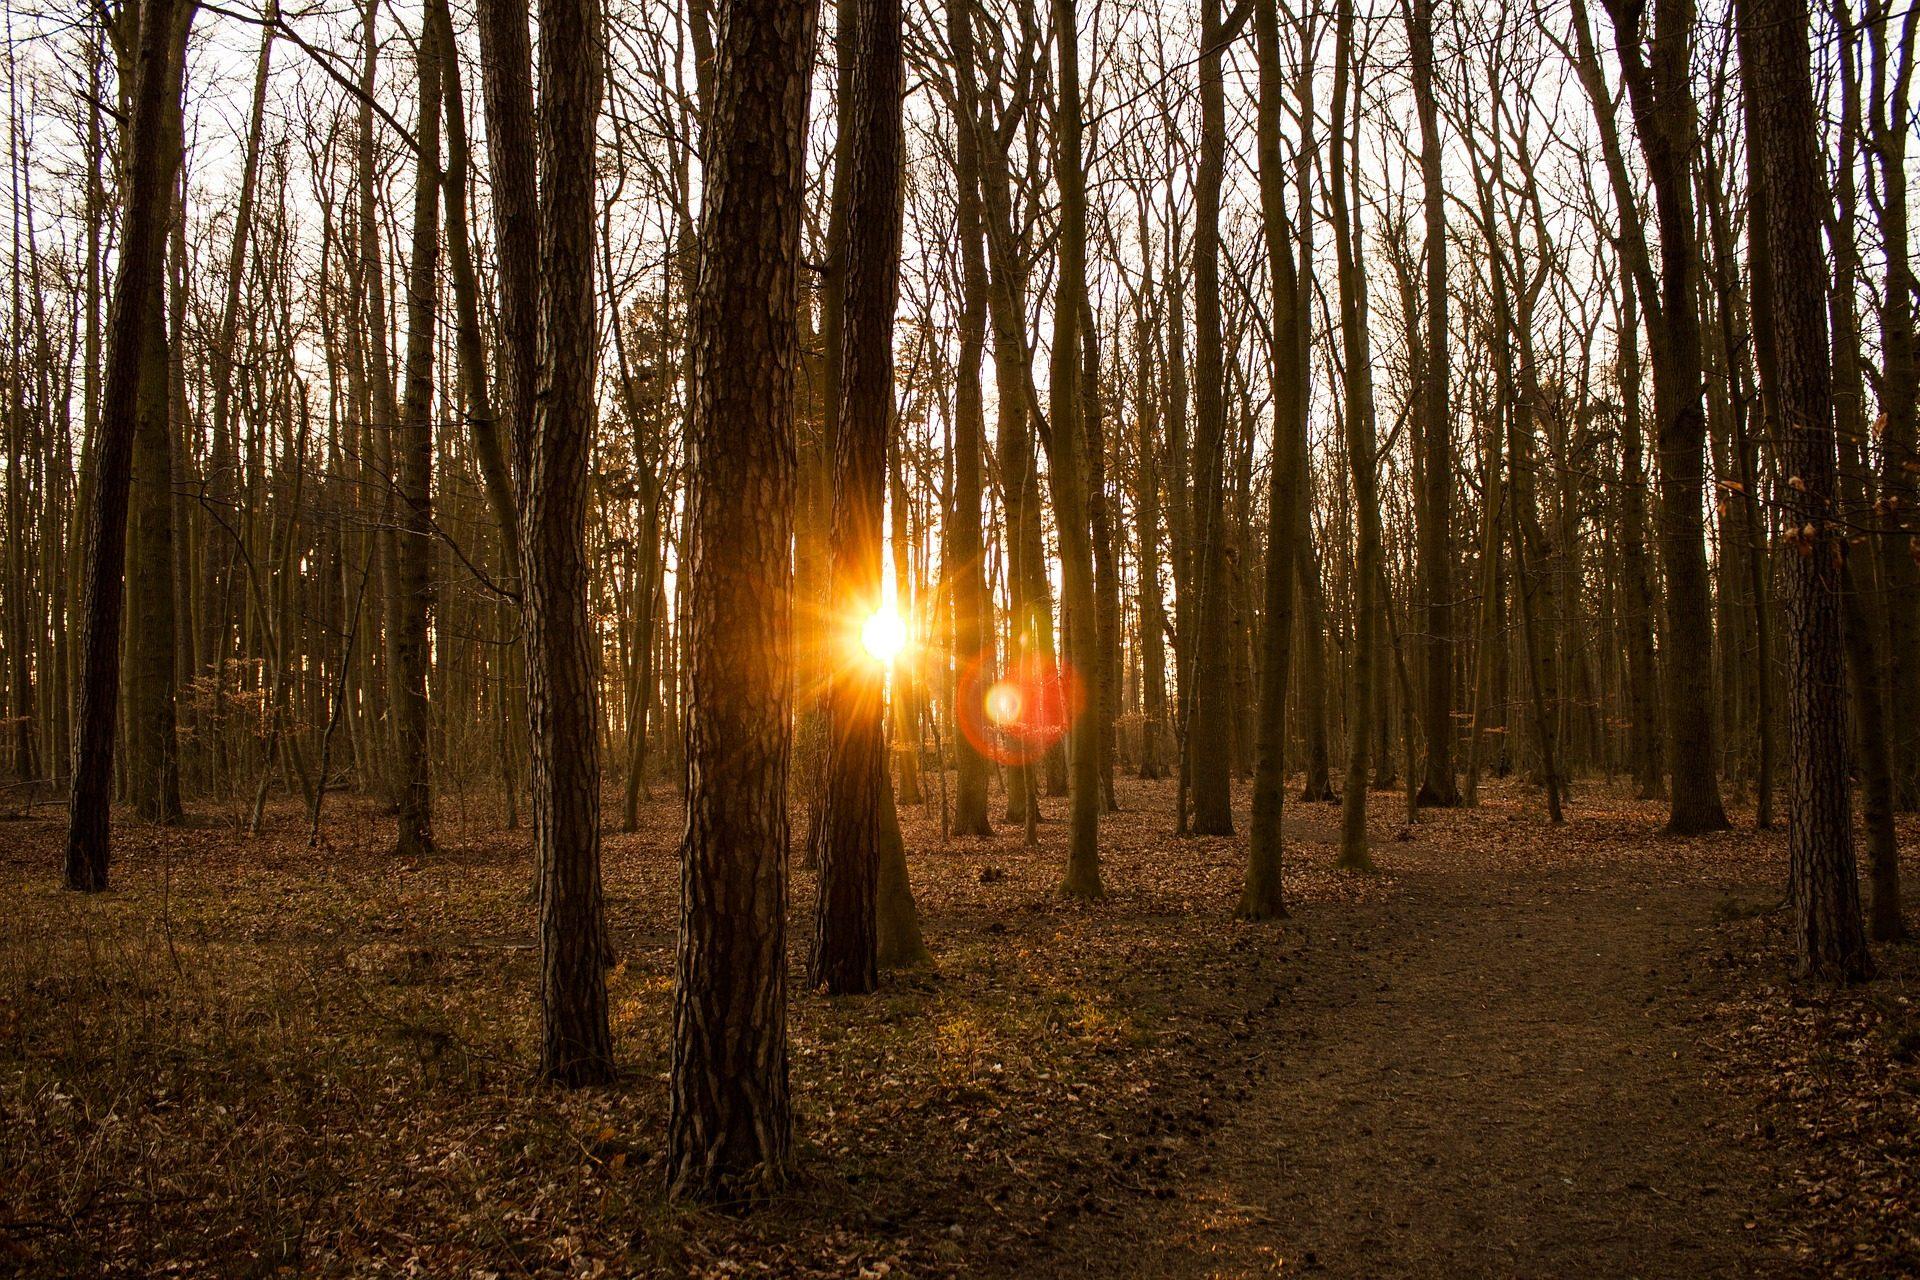 floresta, campo, árvores, Pôr do sol, Ramos, Sol, Raios, halos - Papéis de parede HD - Professor-falken.com